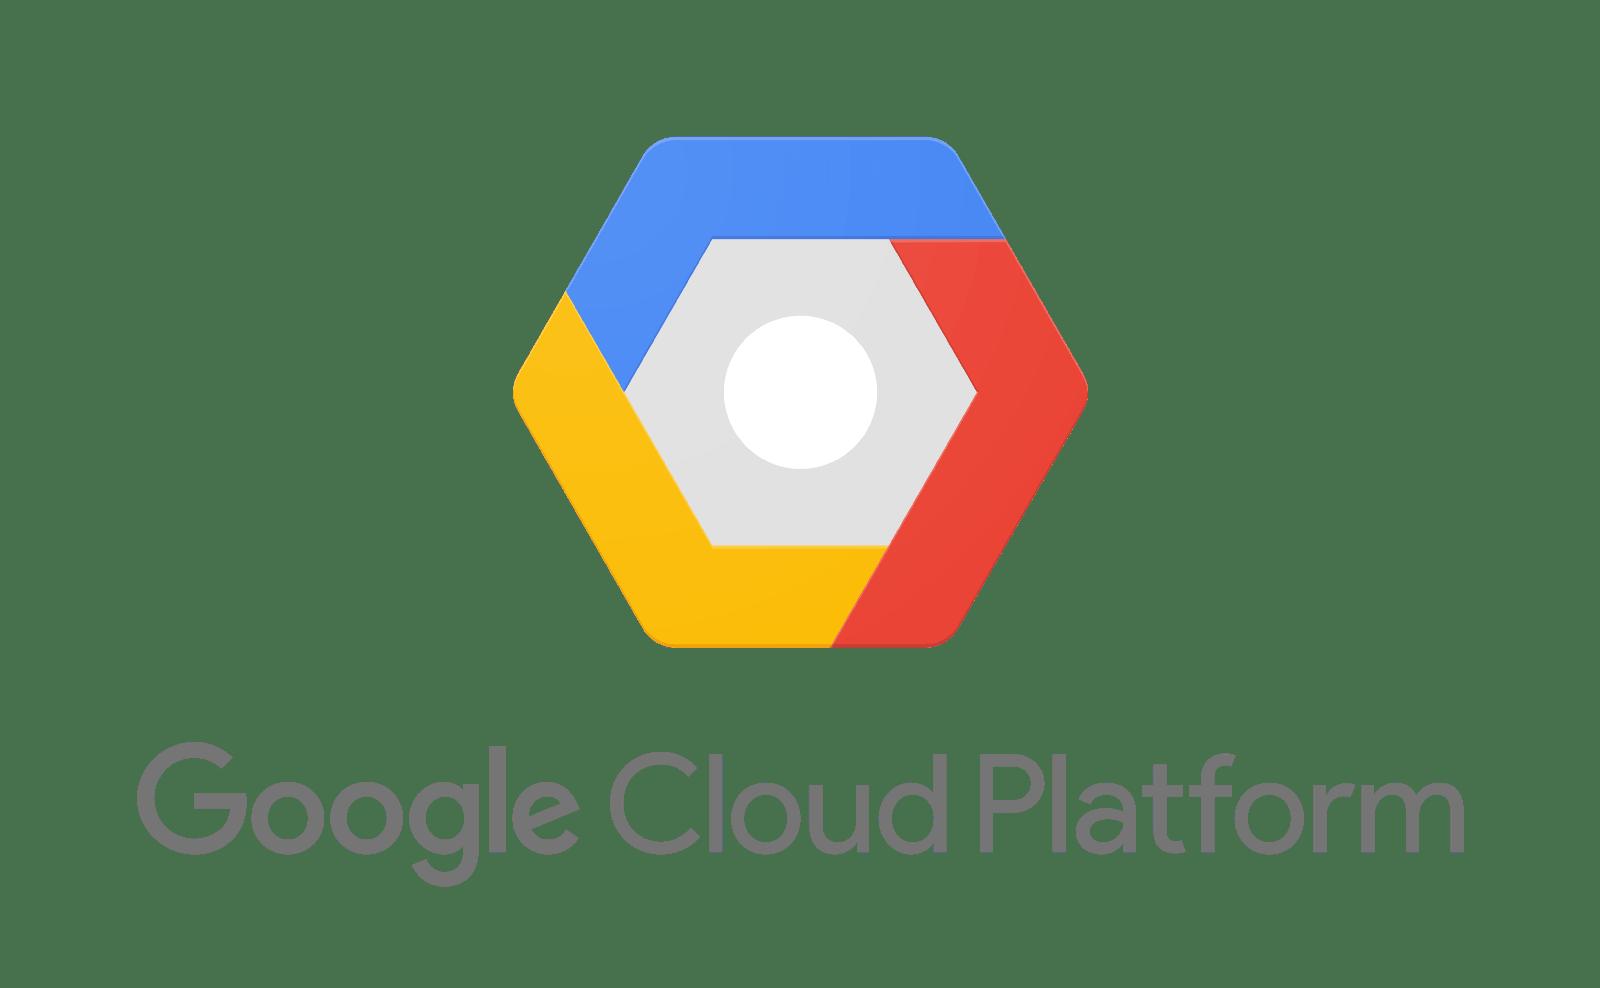 Google Cloud grows faster than AWS